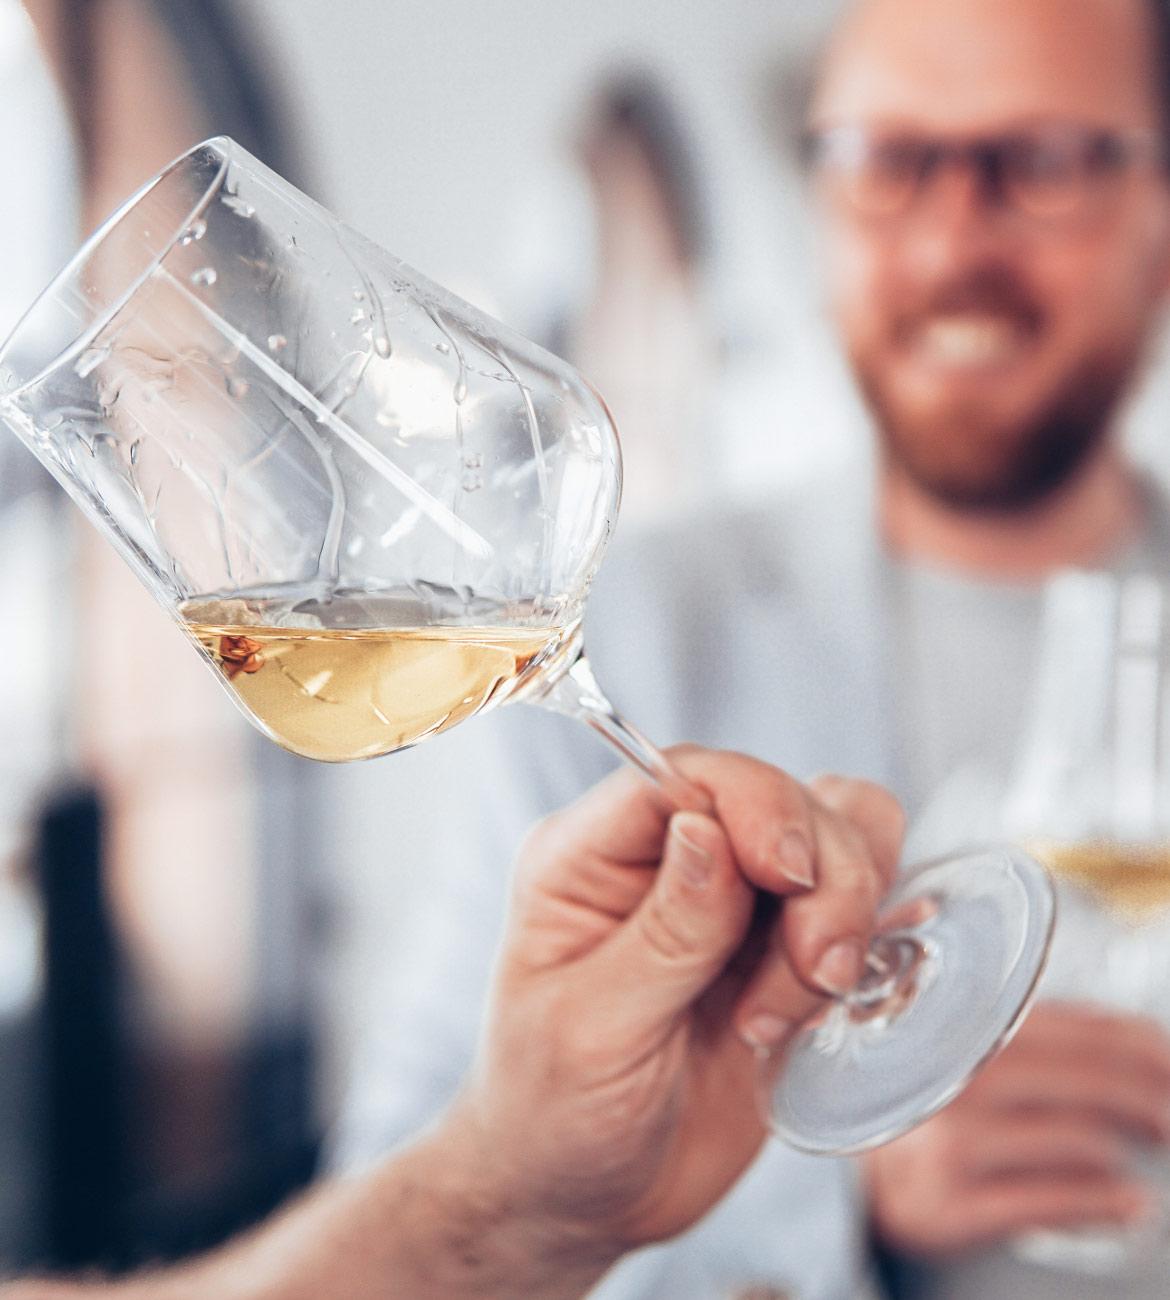 Swan valley wine